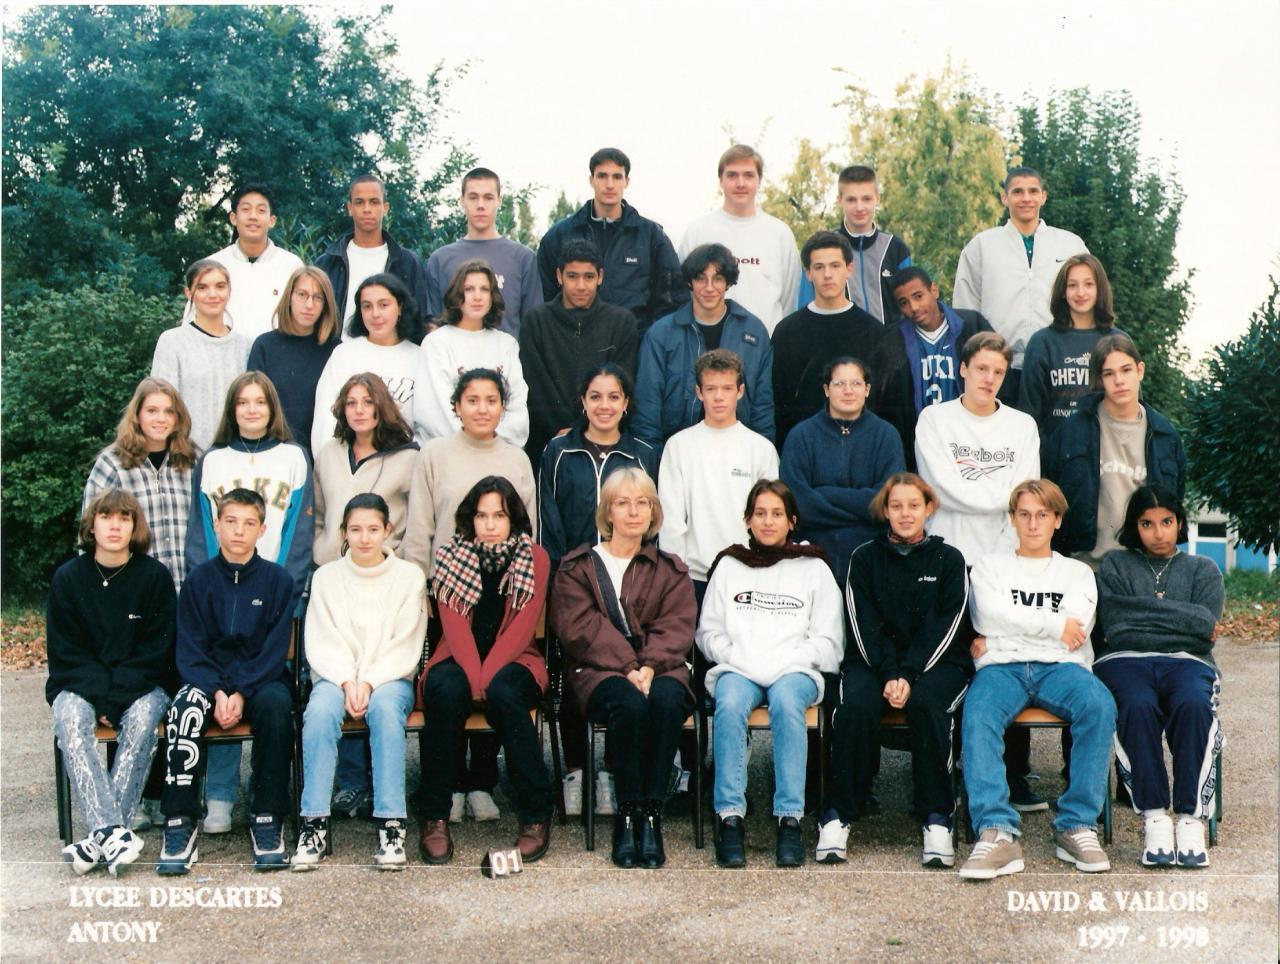 1998 - 2.2 - DAVID